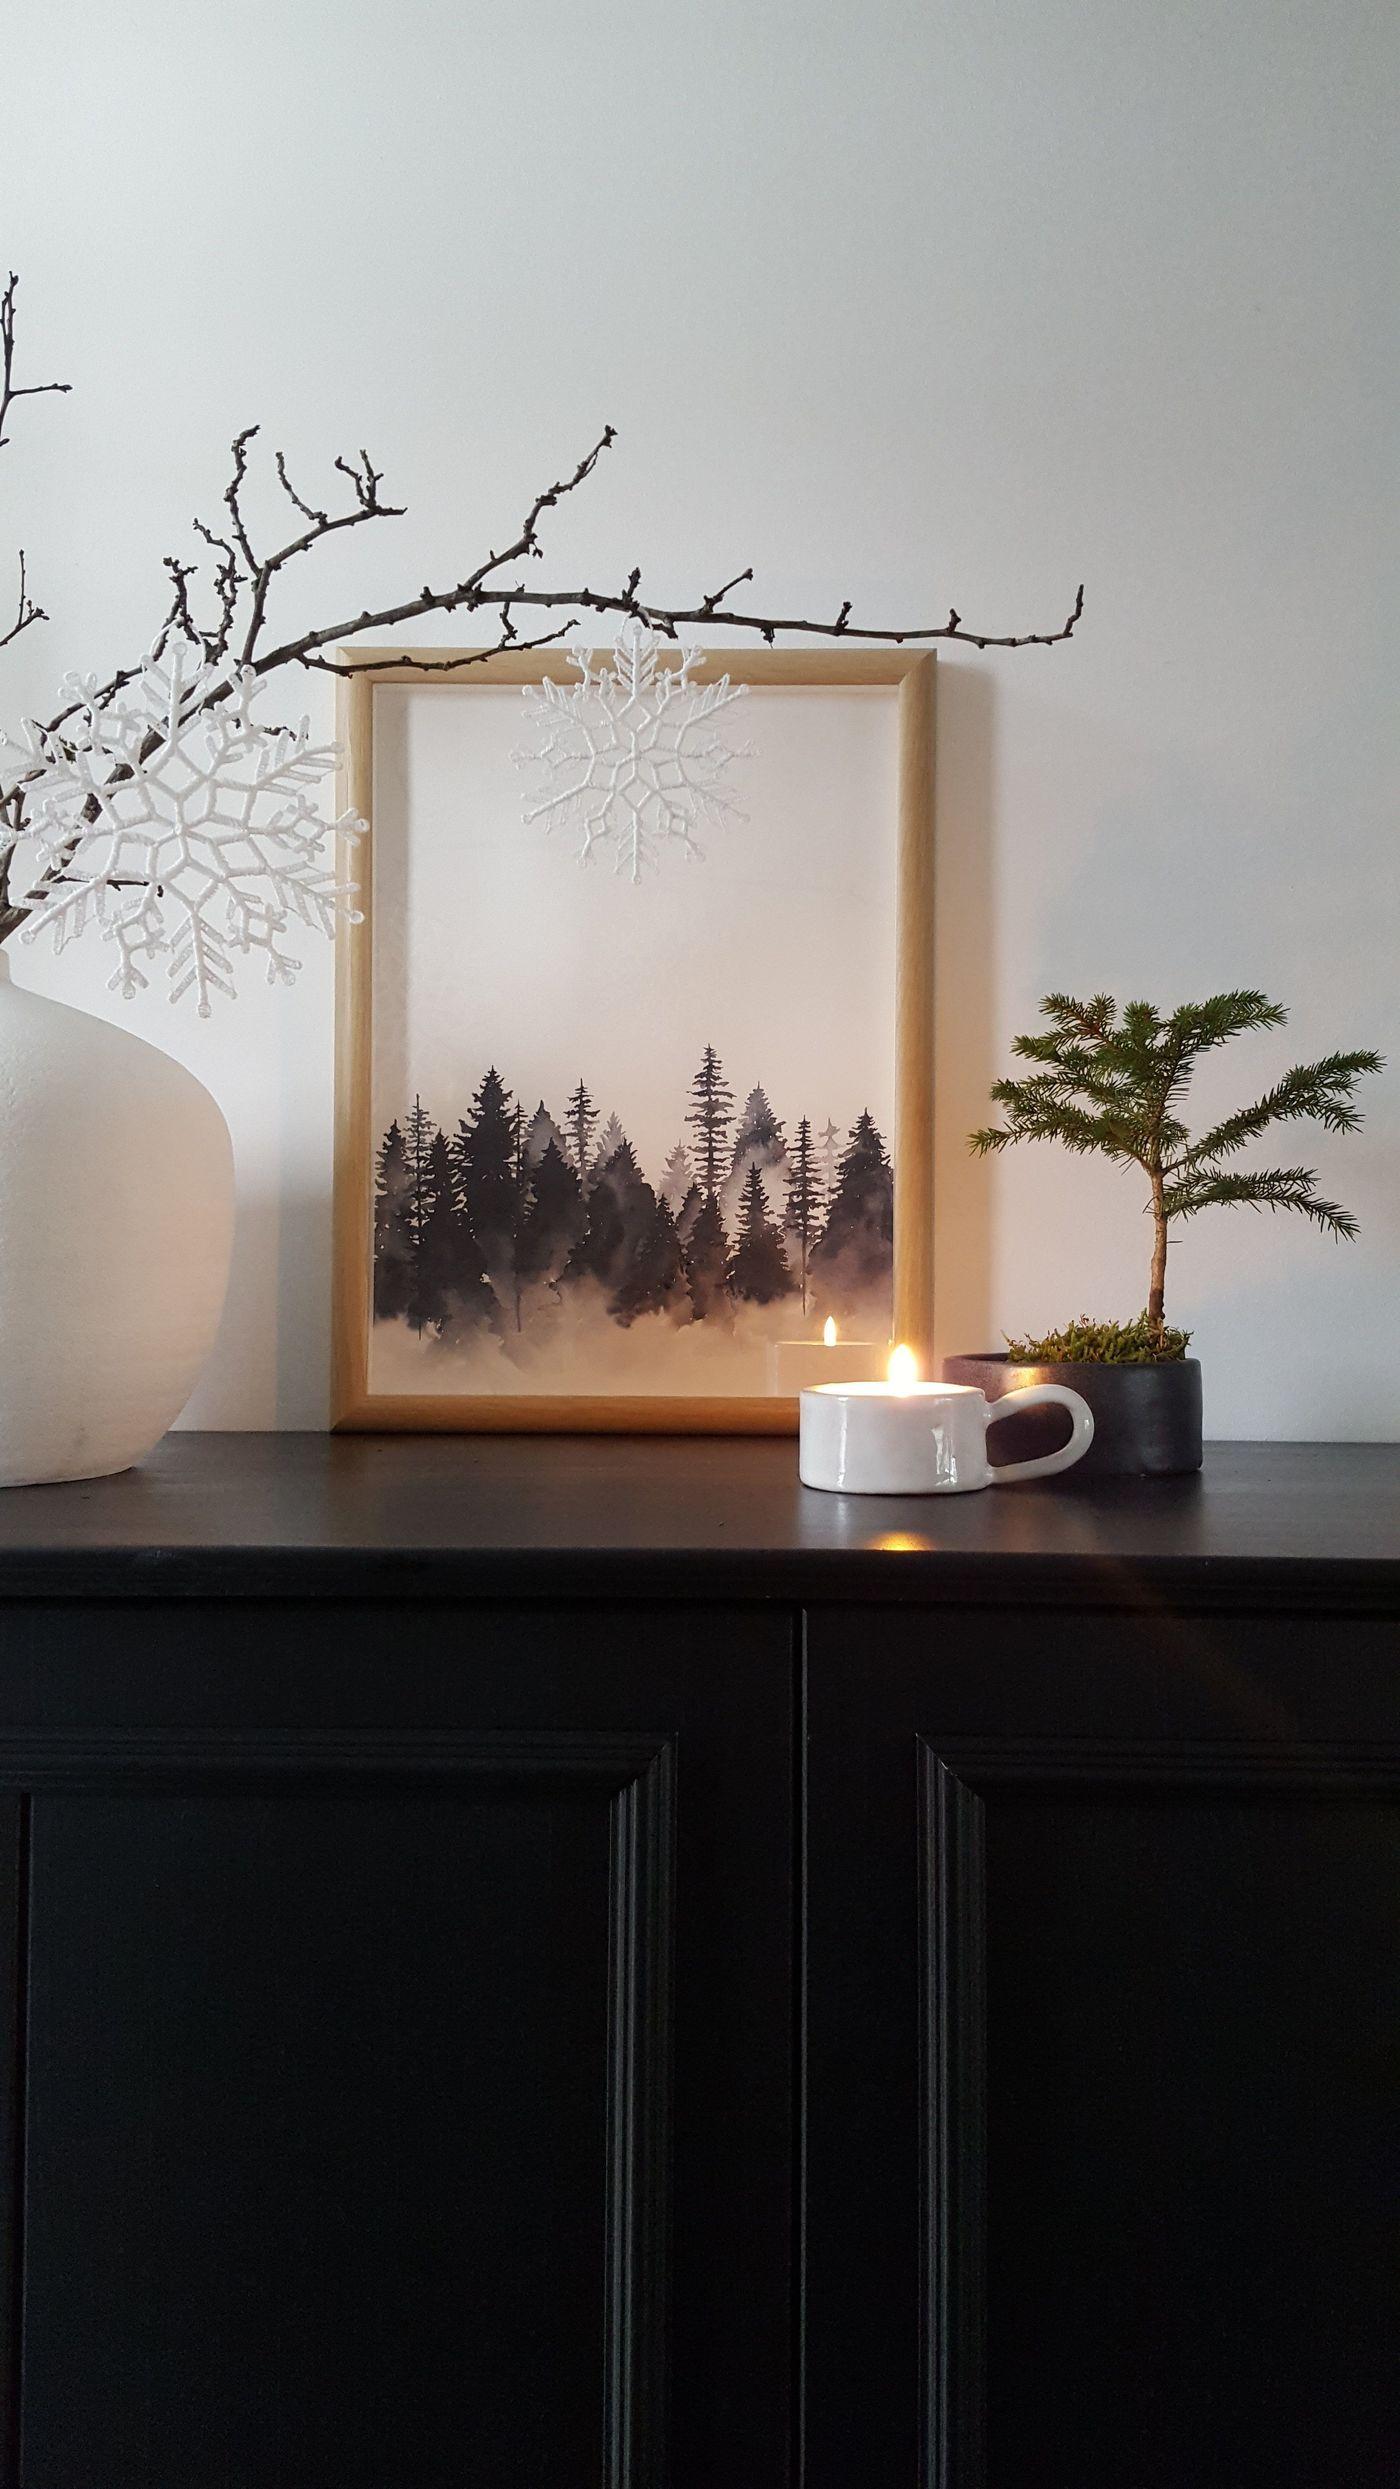 do it yourself ideen f r dein zuhause seite 7. Black Bedroom Furniture Sets. Home Design Ideas